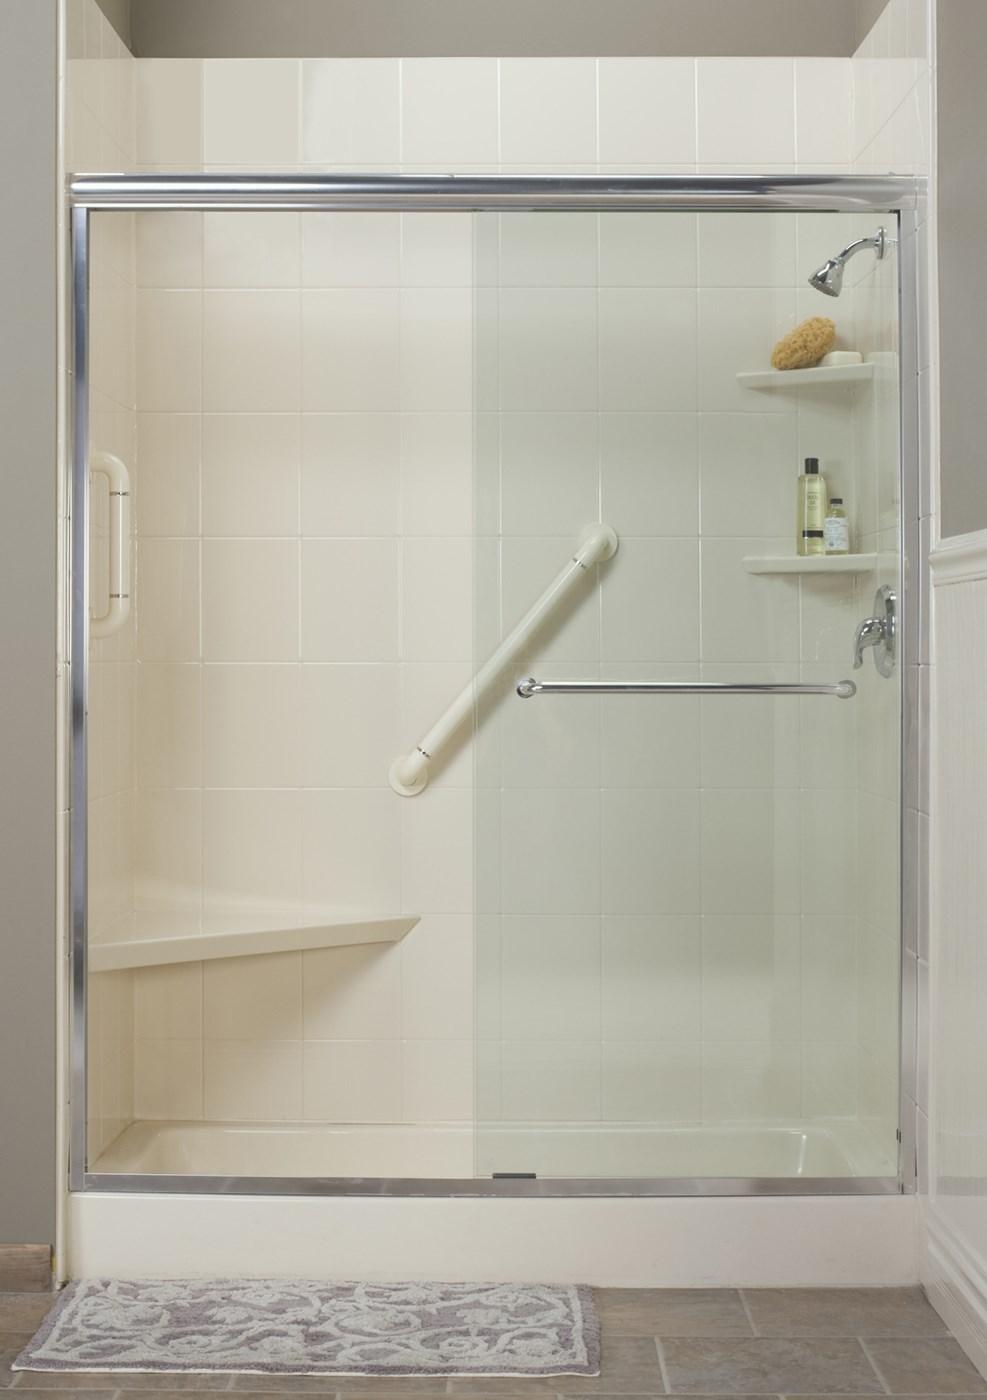 New england tub to shower conversion boston bath - Bathroom remodel tub to shower conversion ...